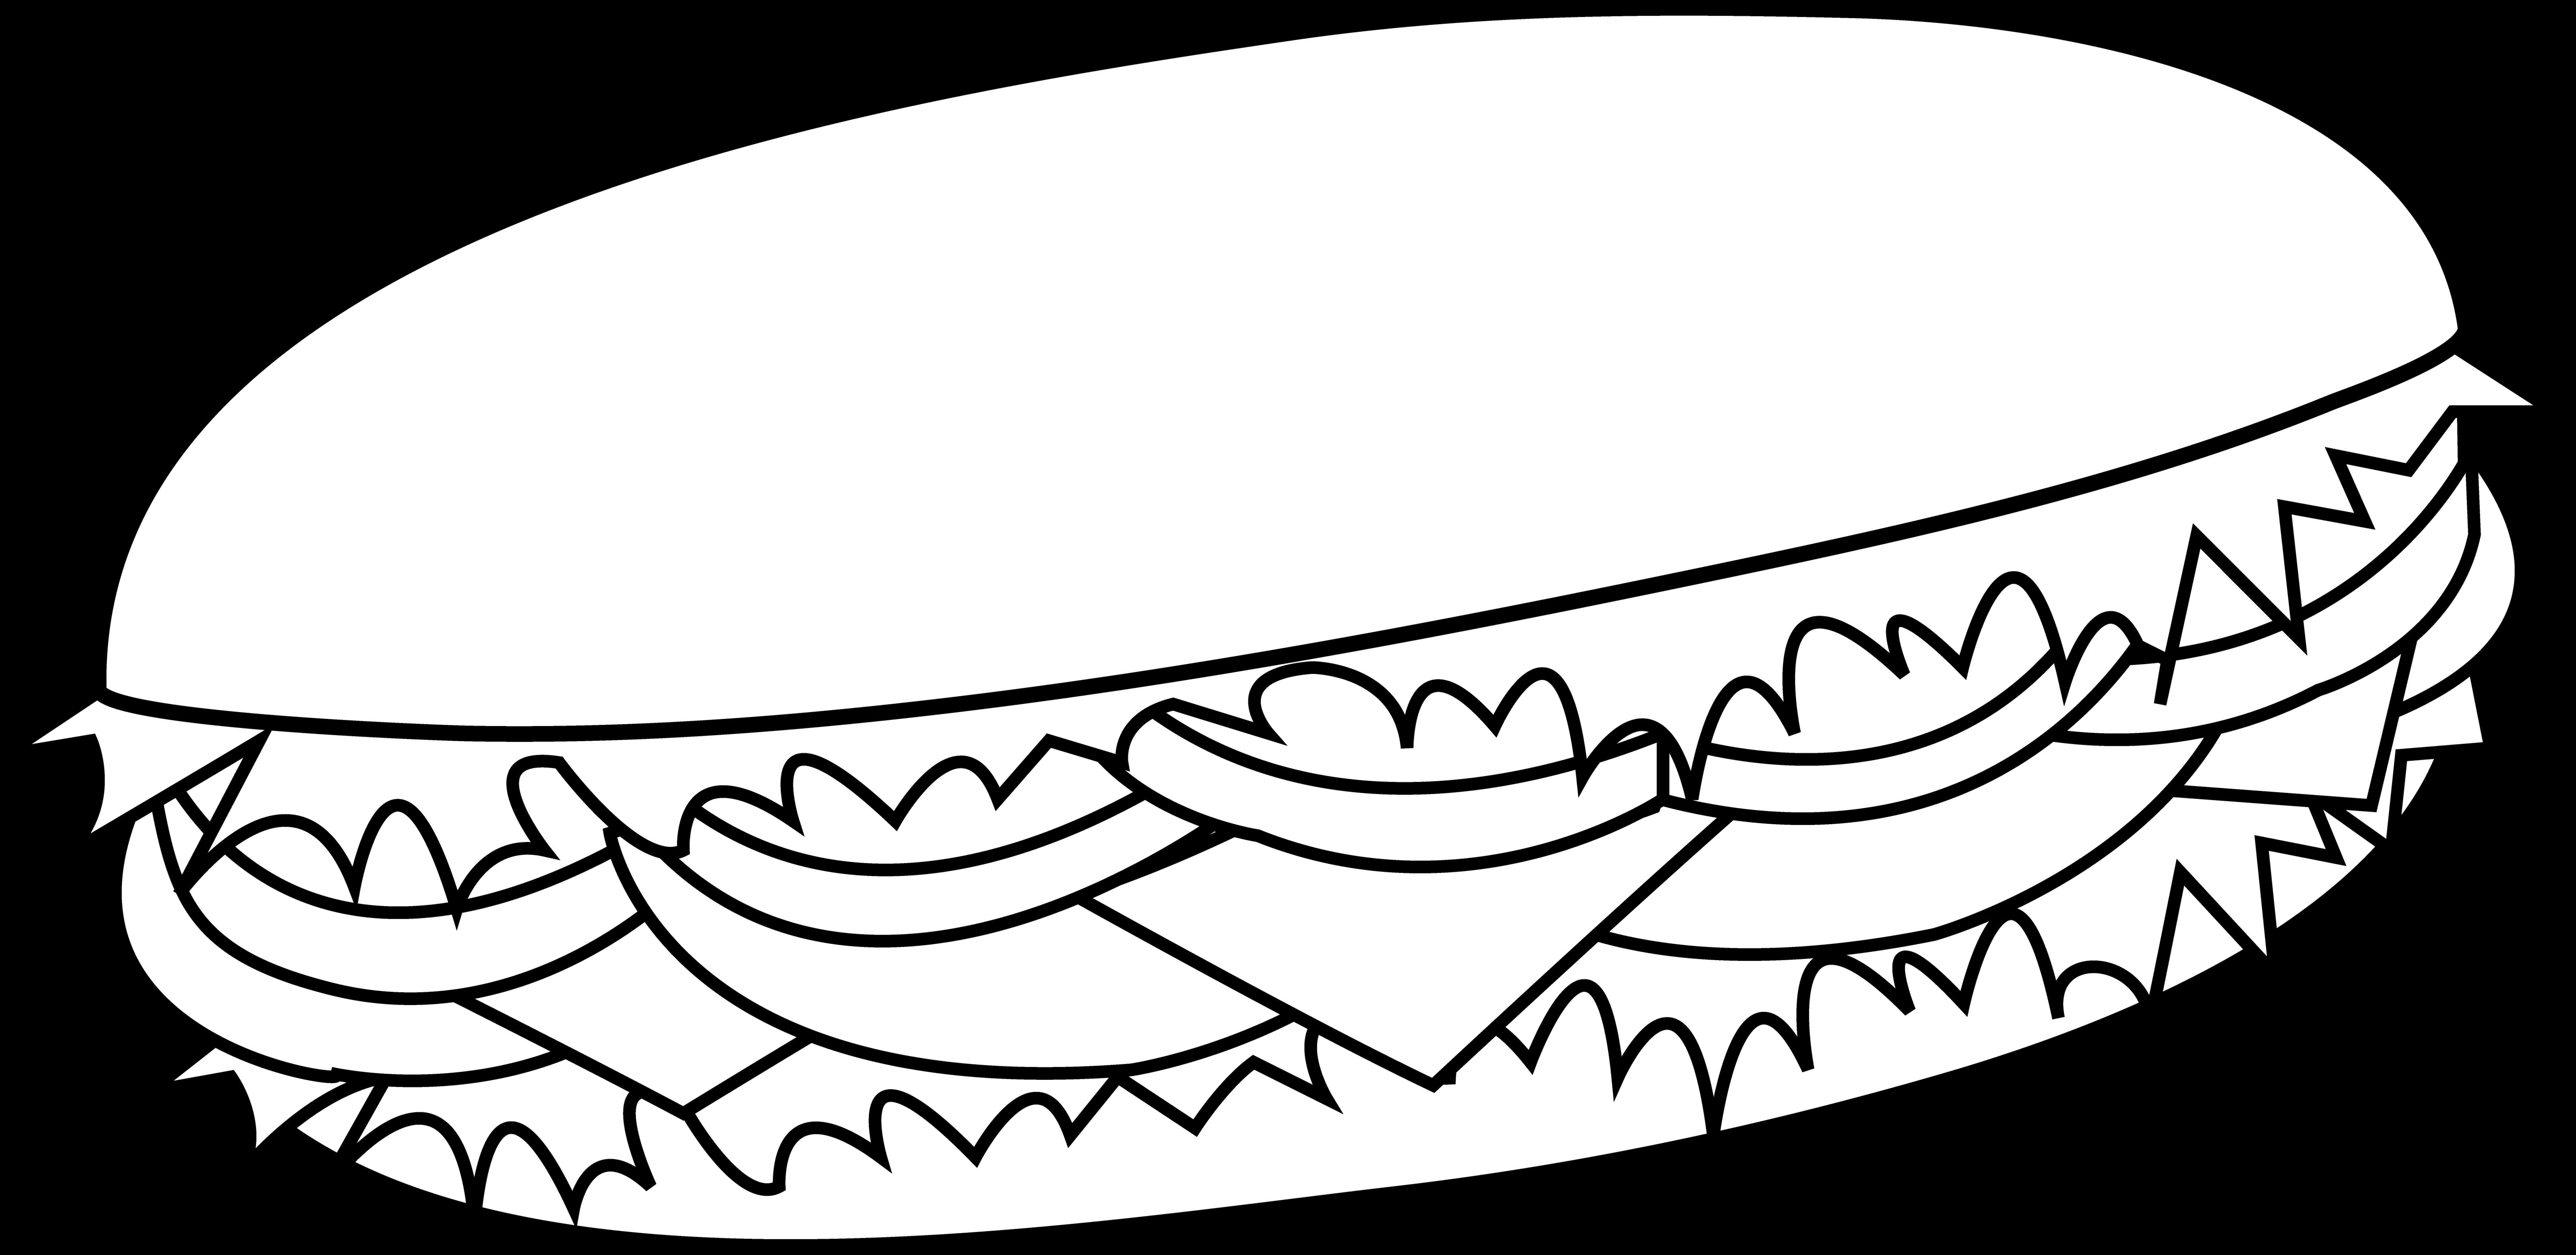 Burger clipart black and white Cliparts Free Clip Black